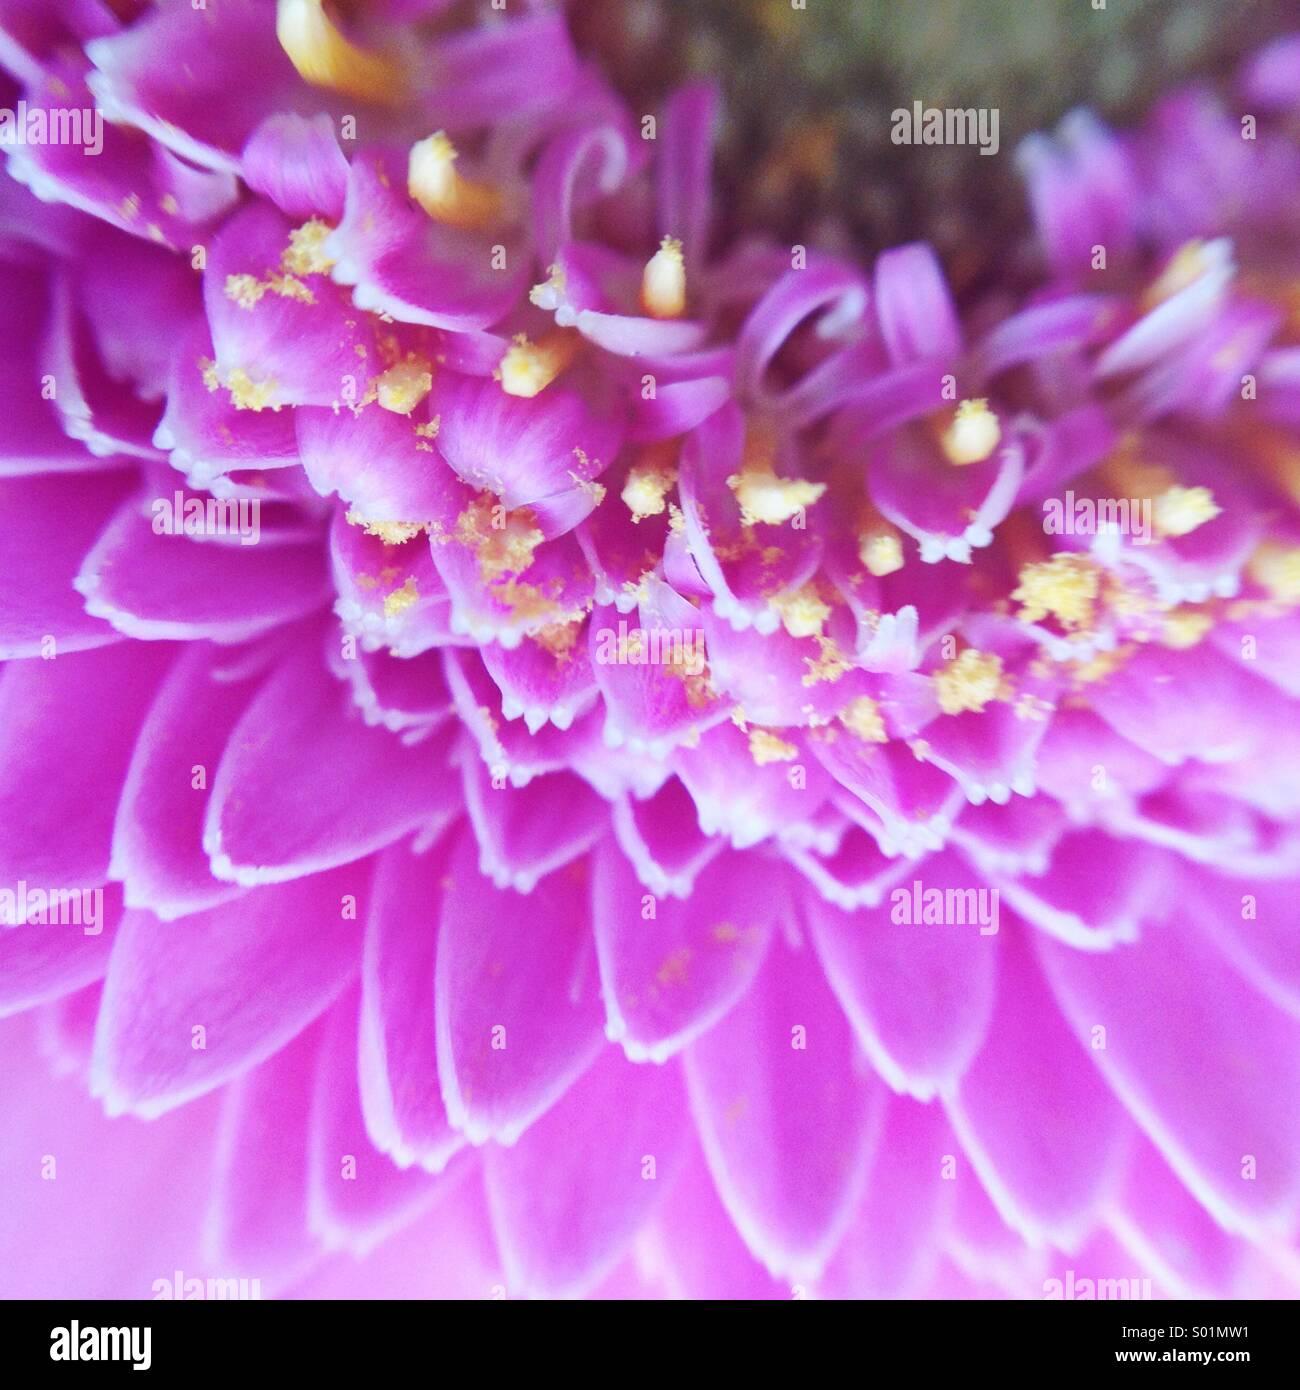 Radiant orchid Immagini Stock